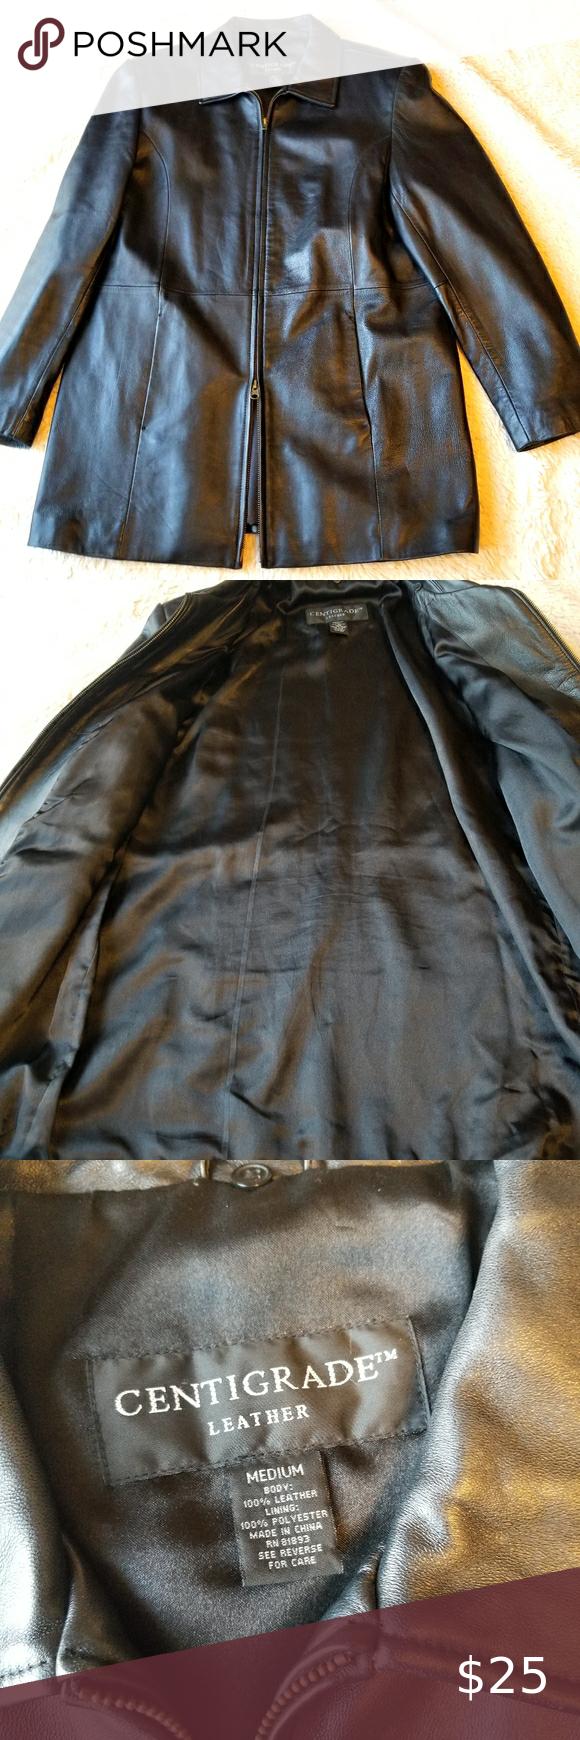 Centigrade Black Leather Jacket Double Zipper M Fur Leather Jacket Leather Jackets Women Harley Davidson Leather Jackets [ 1740 x 580 Pixel ]